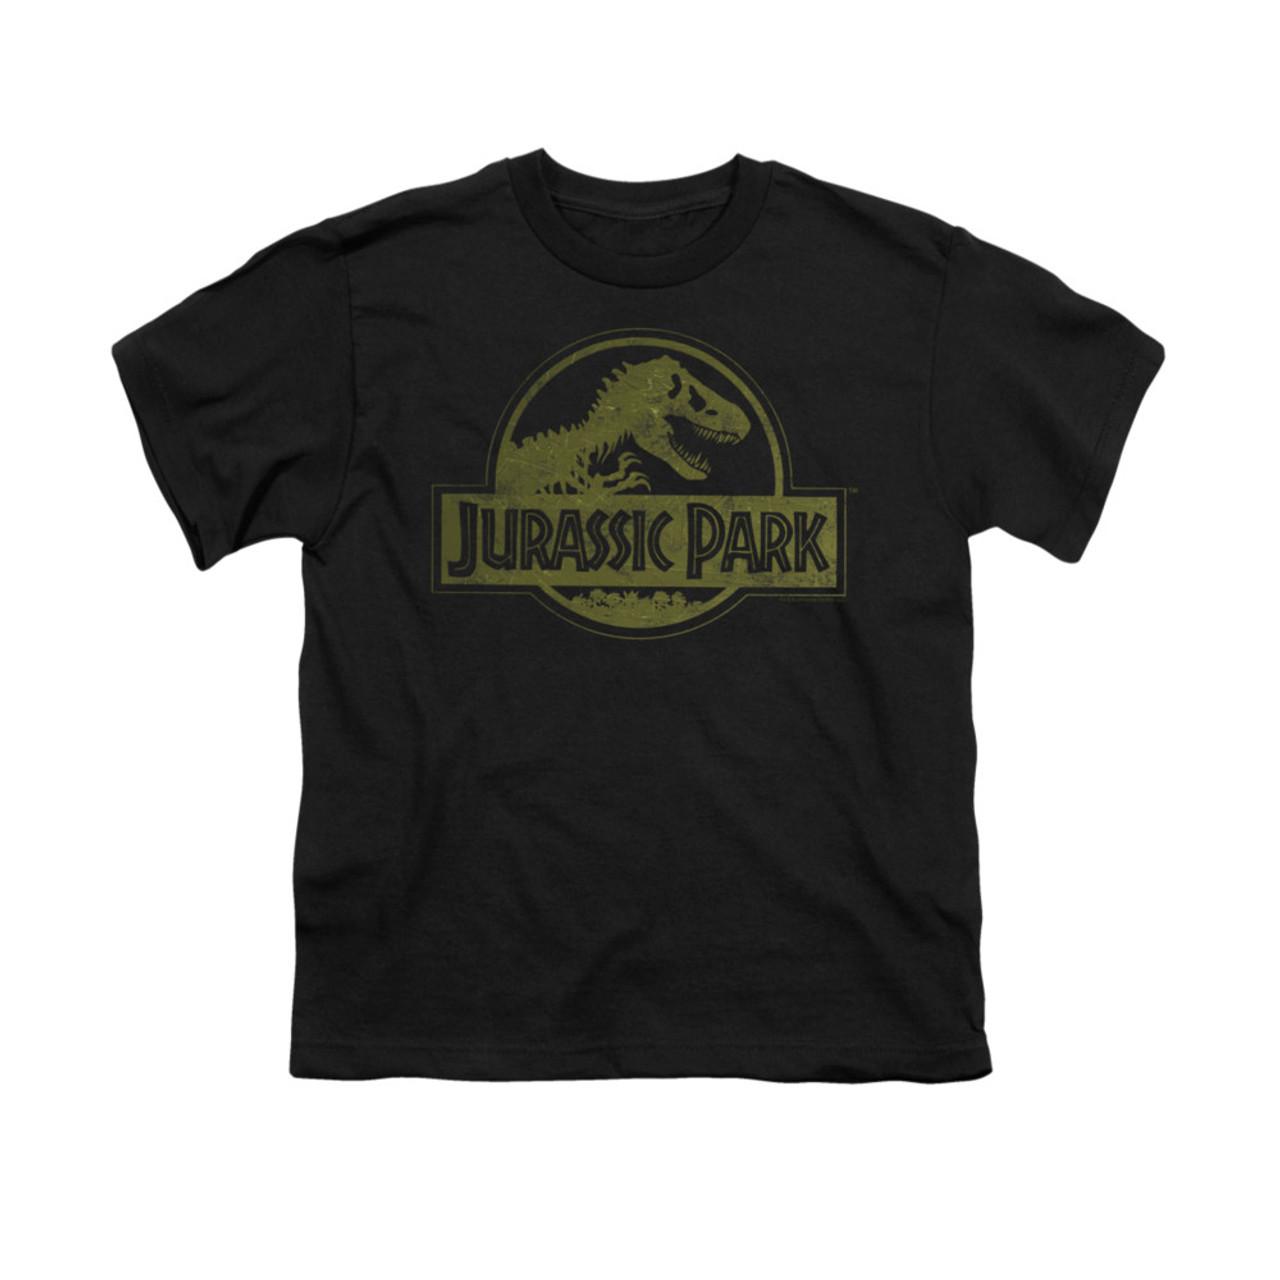 Jurassic Park Distressed Logo Youth T-shirt